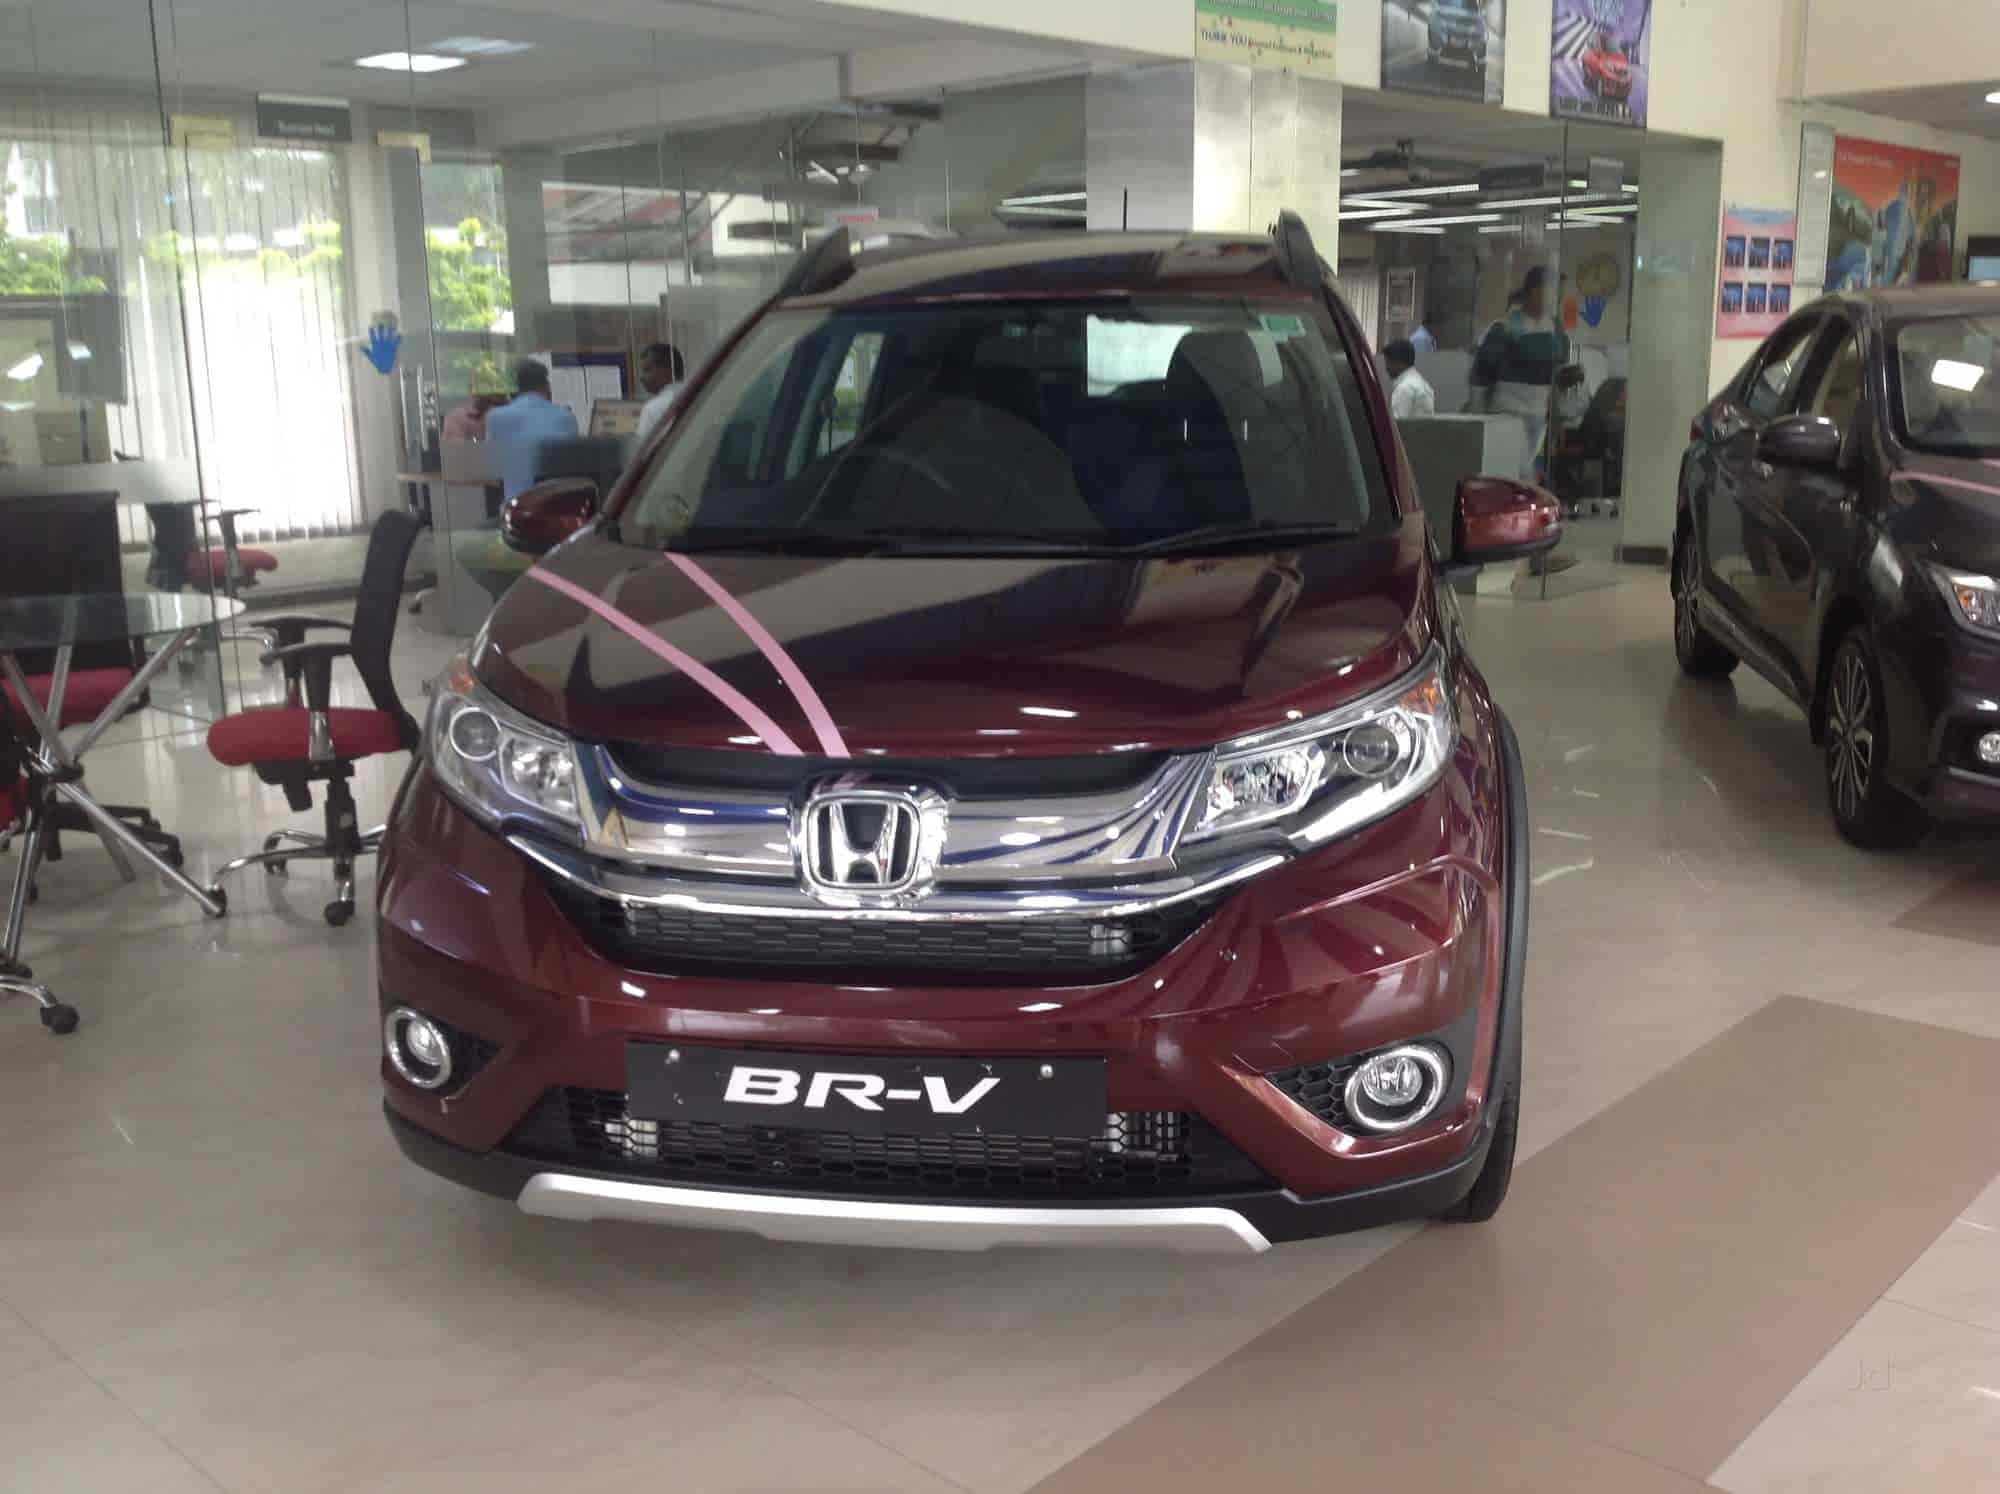 Sundaram Honda Mount Road Sunderam Honda Car Dealers In Chennai